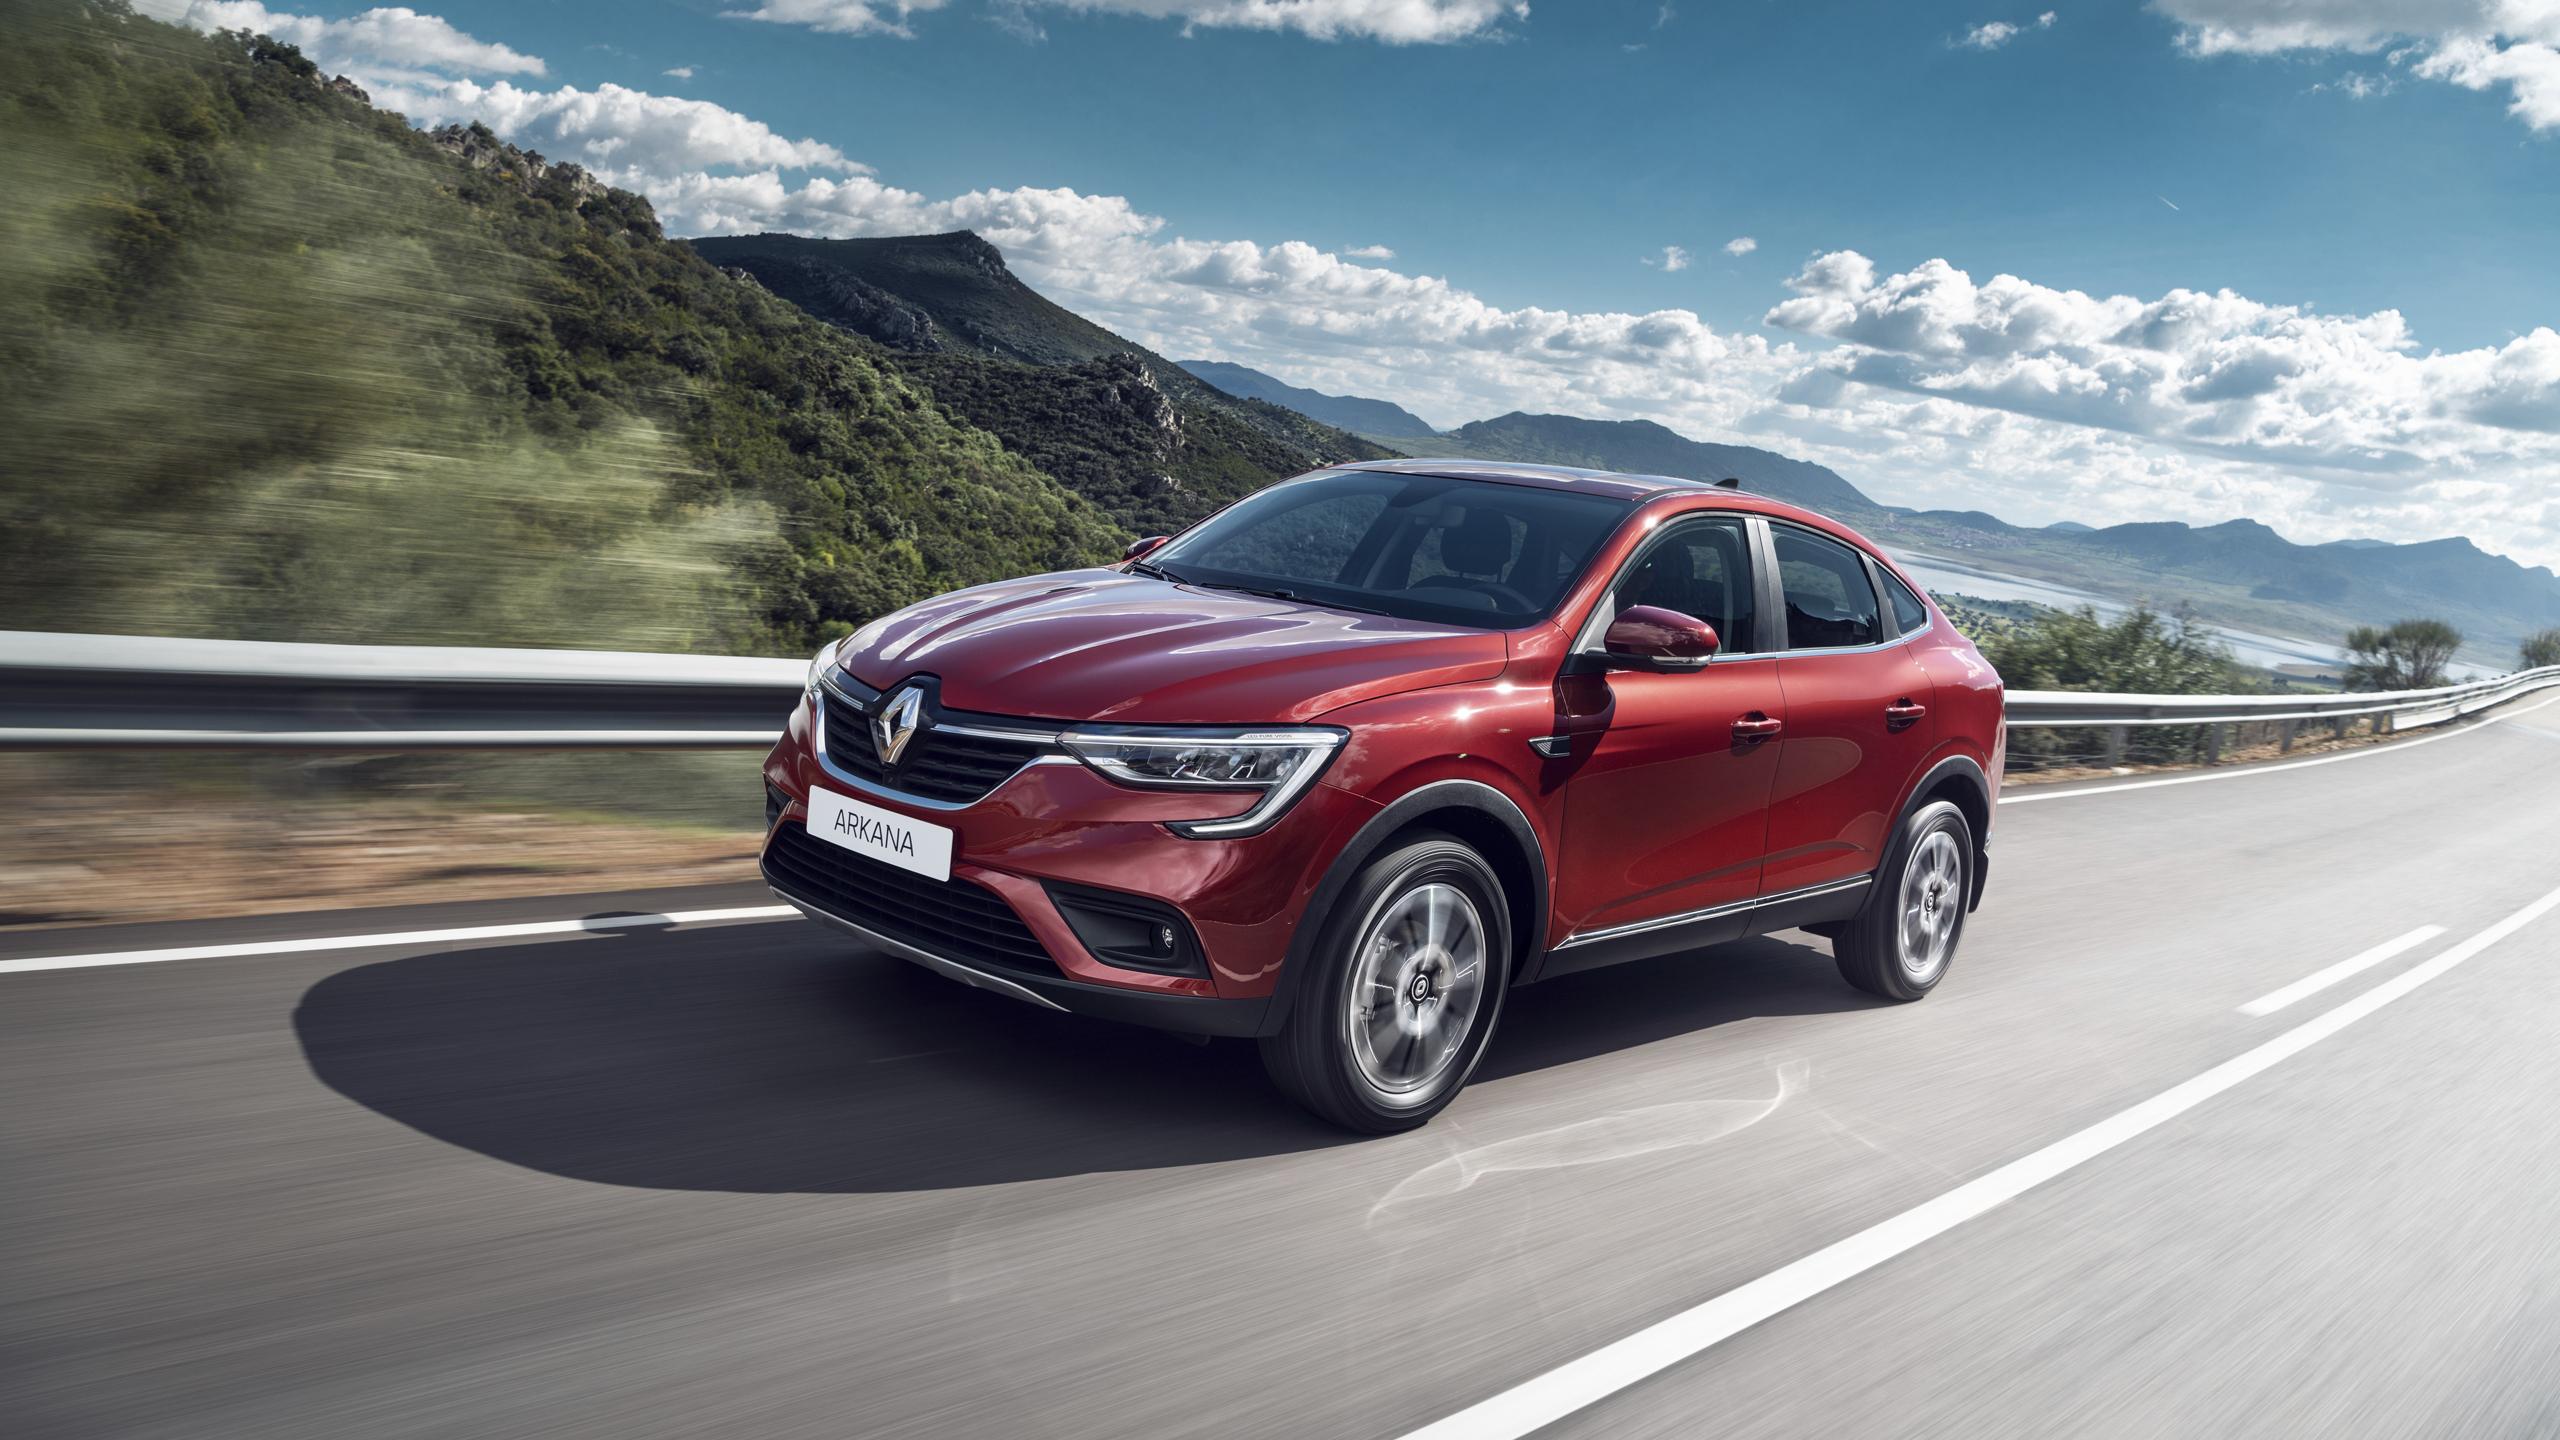 НОВИЙ Renault ARKANA  фото 1